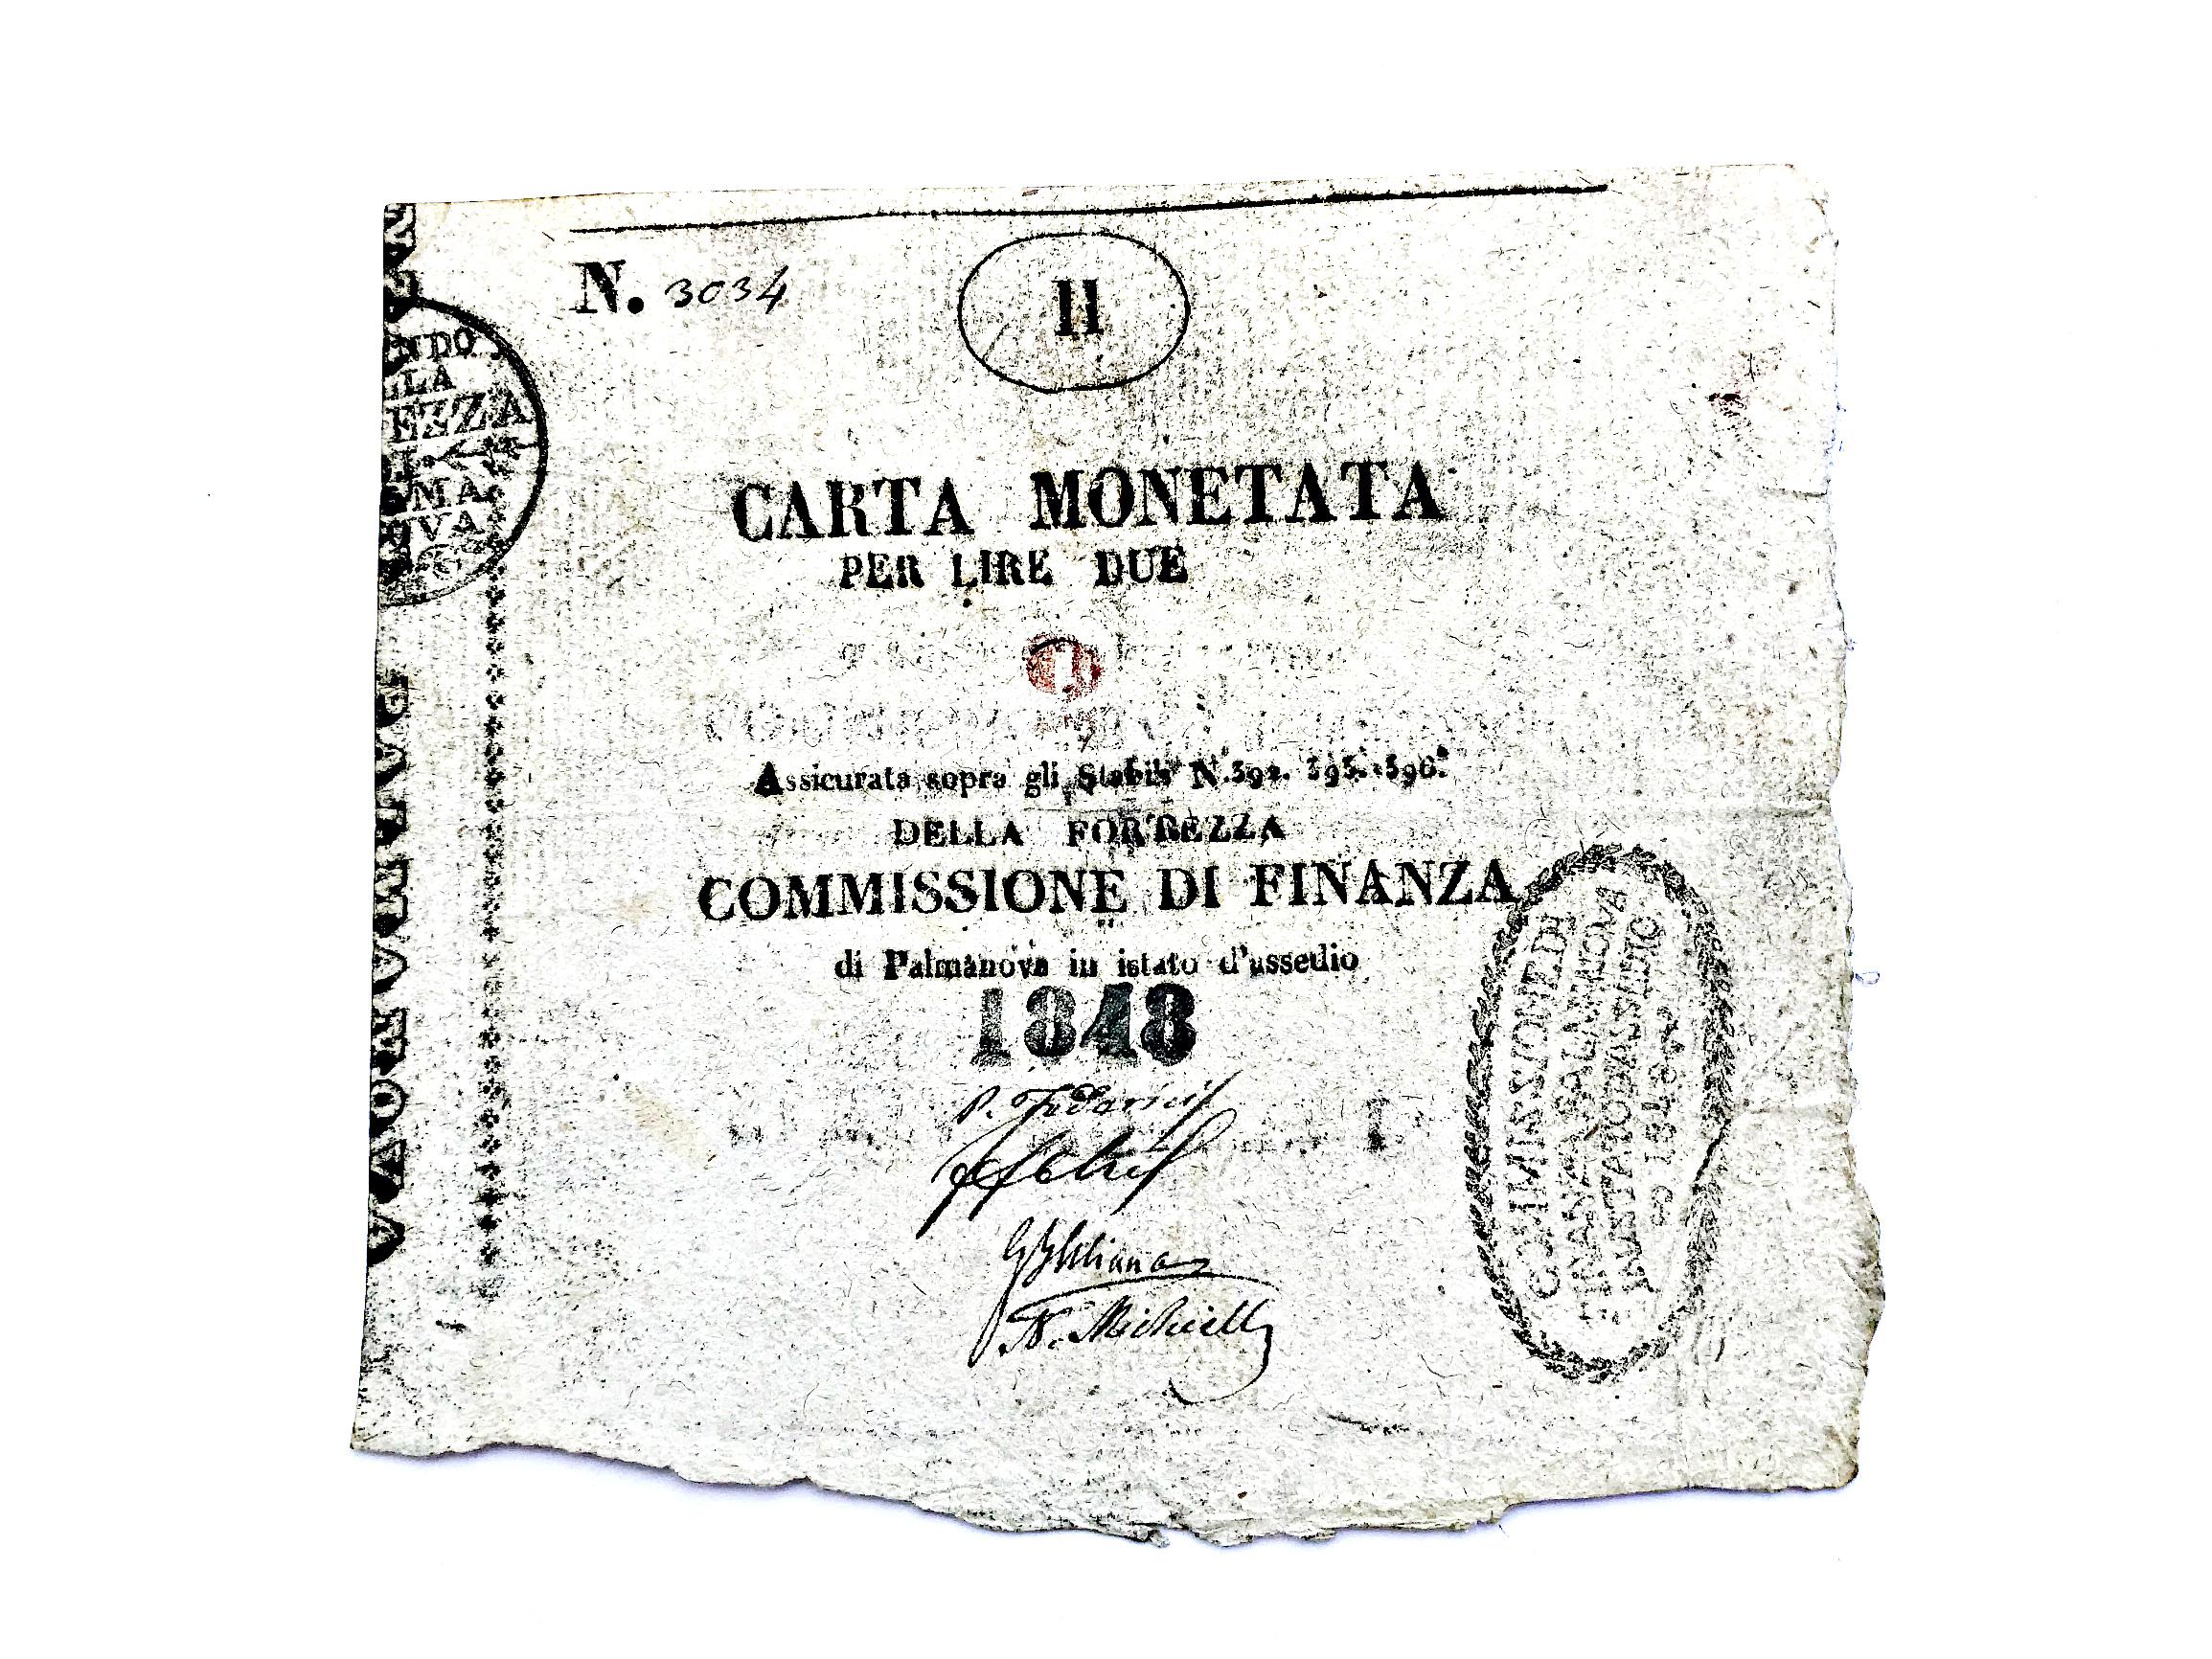 Banknotes Carta Mоnetata